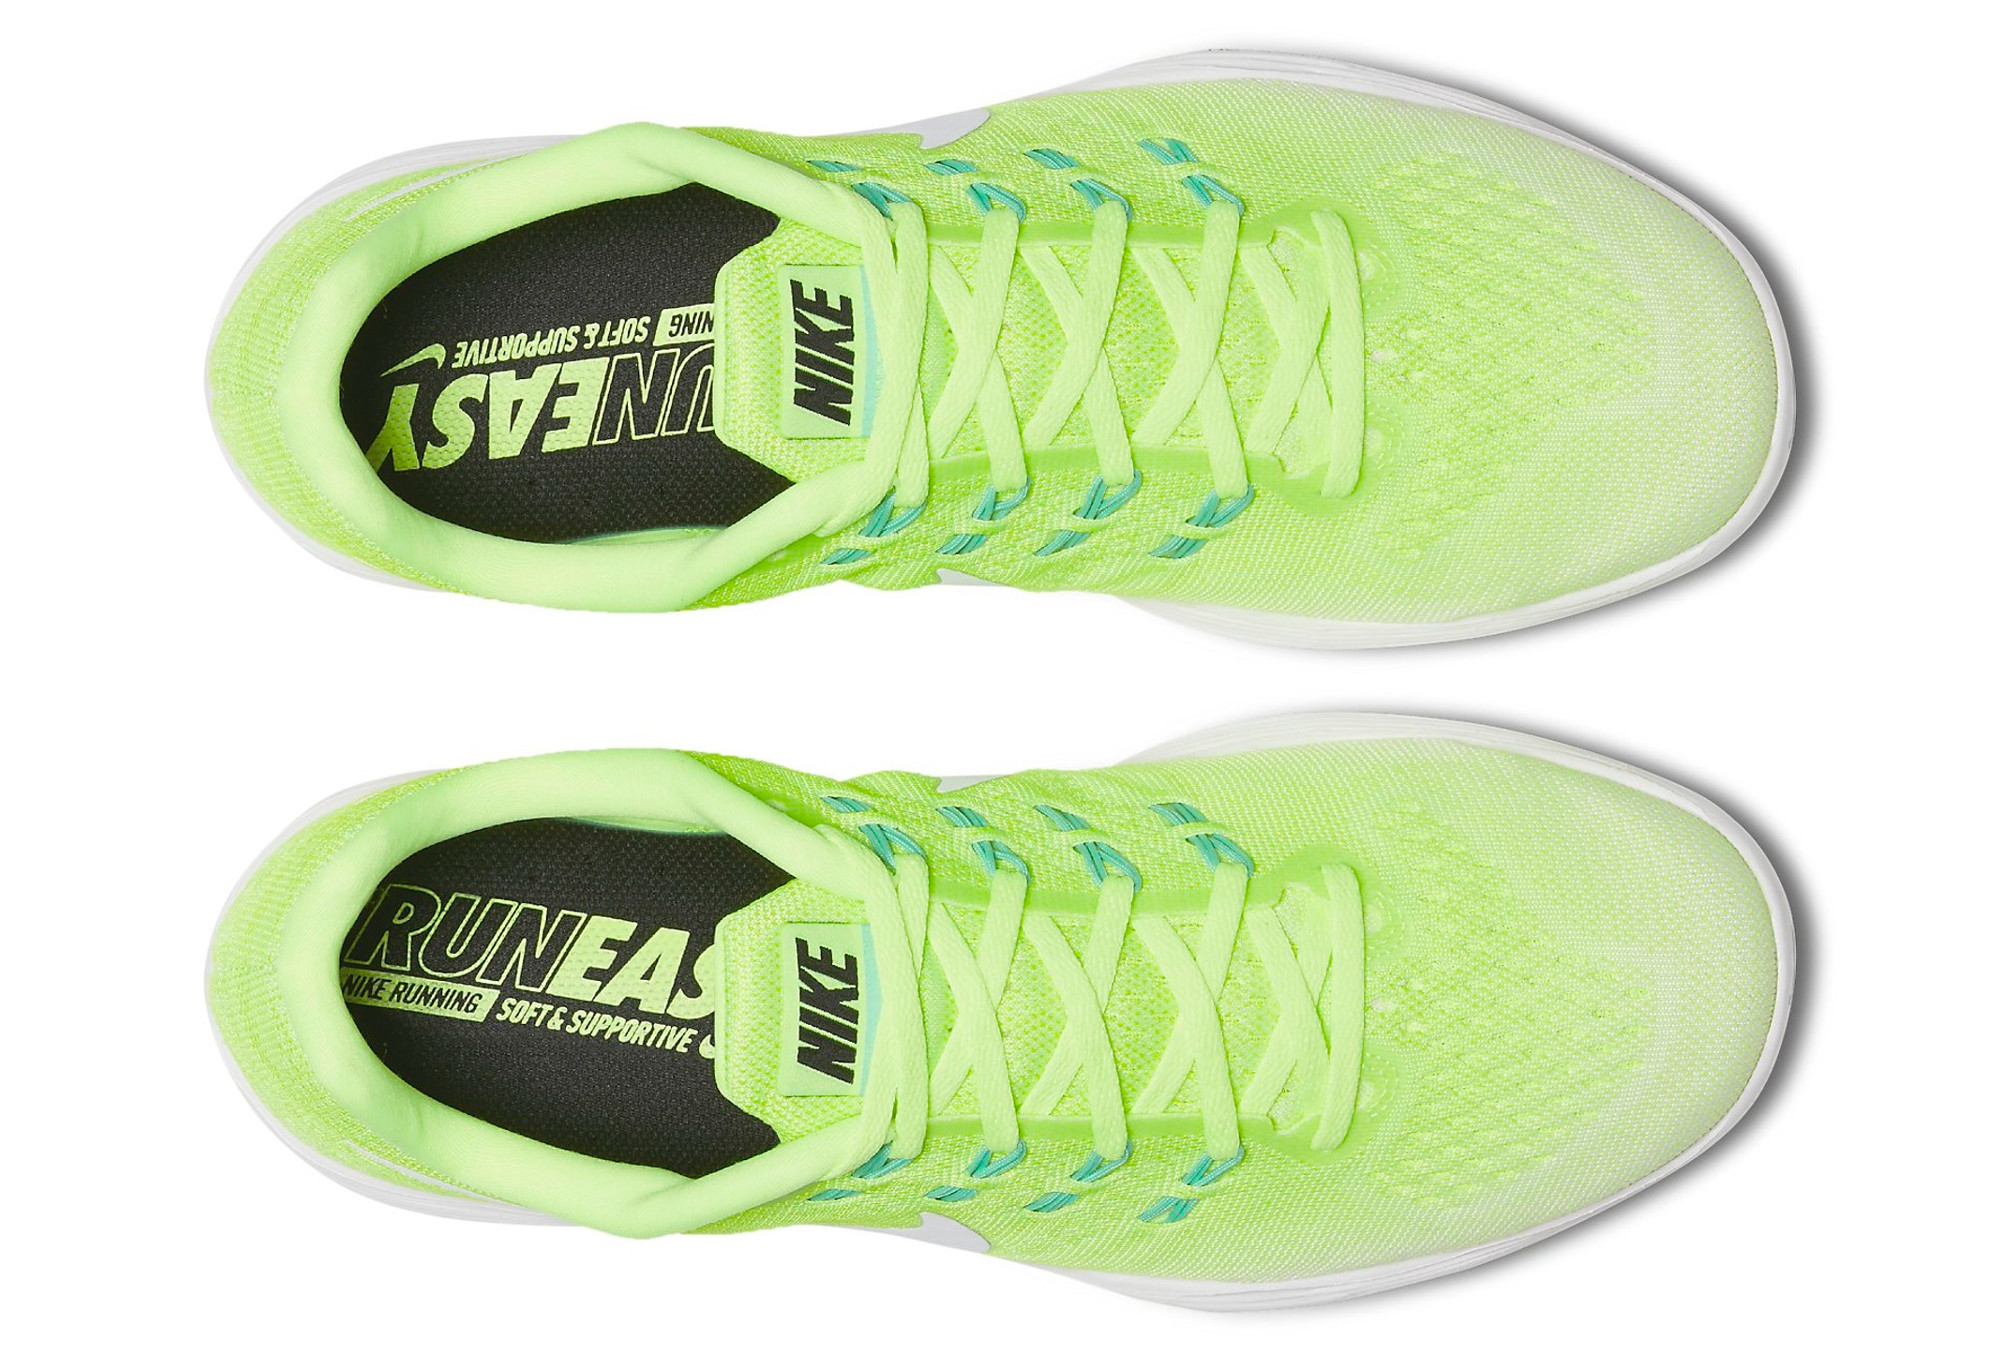 quality design 5ec1b d9bee Nike Shoes LunarTempo 2 Yellow Men